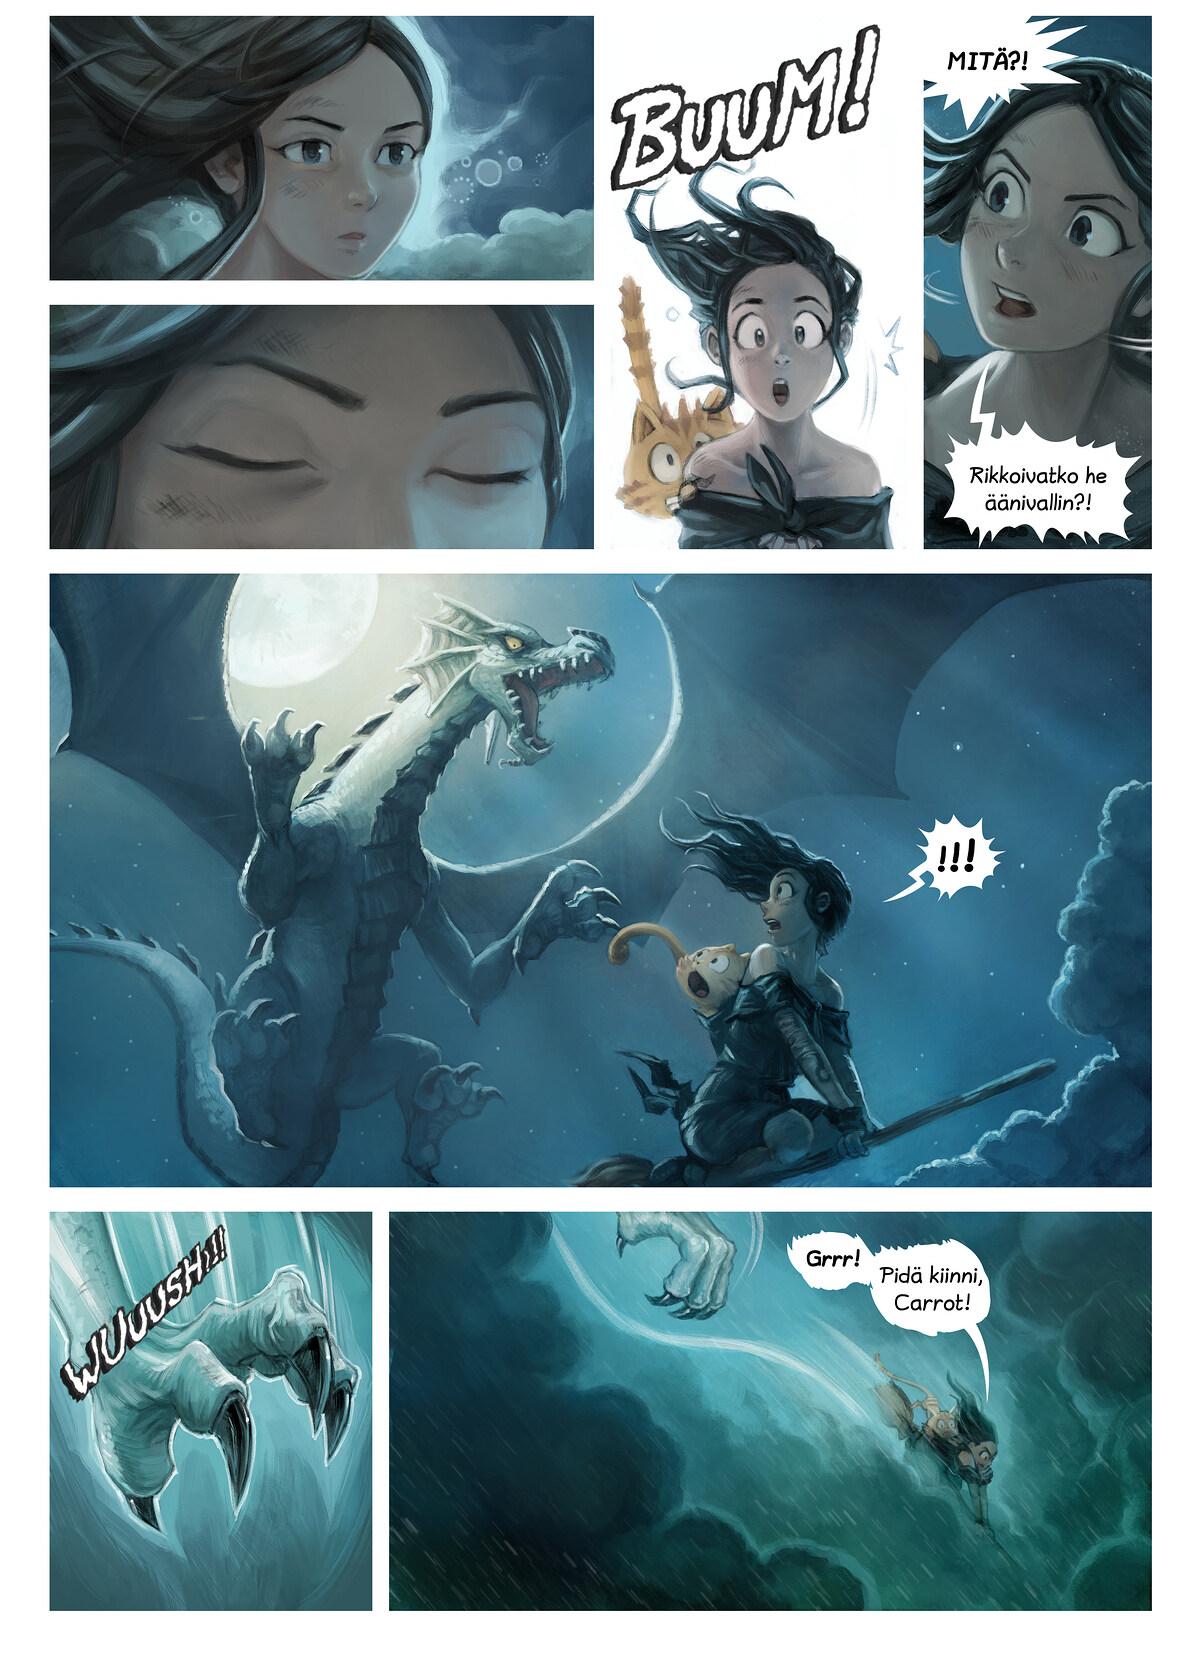 Episodi 35: Heijastus, Page 4